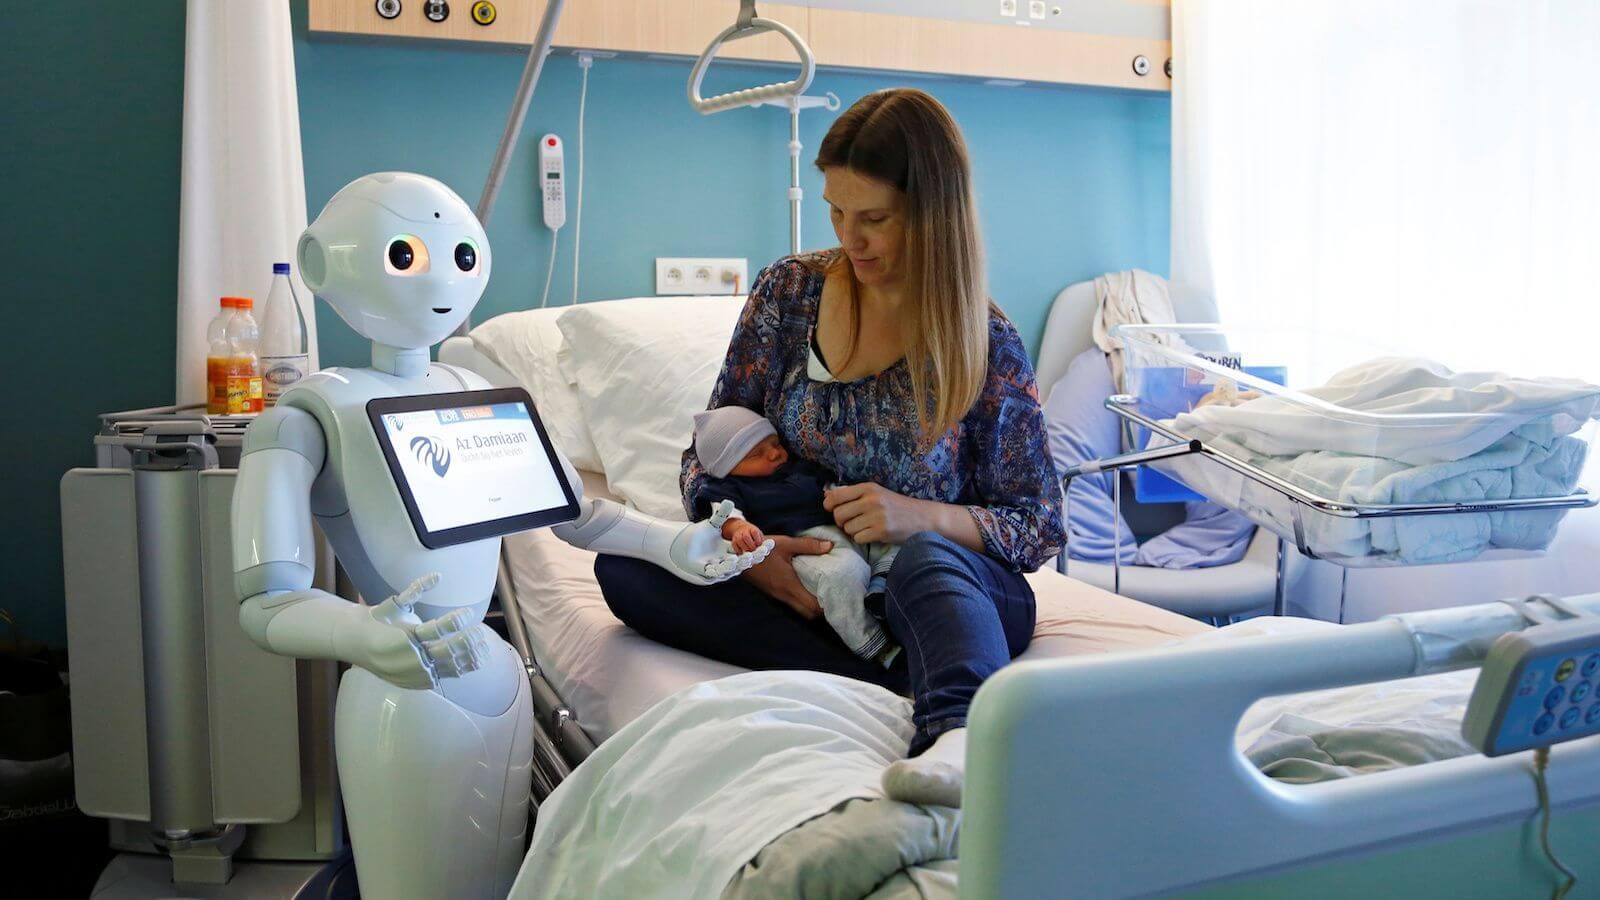 6-17-2018 robot-helping-baby